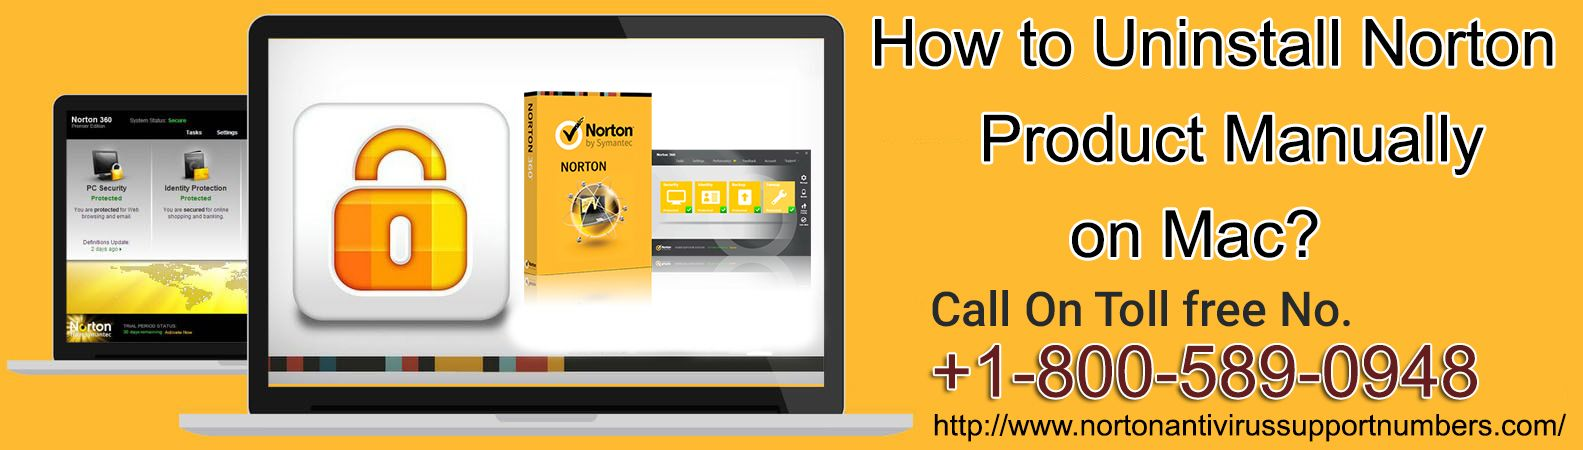 How to Uninstall Norton Product Manually on Mac?   Norton